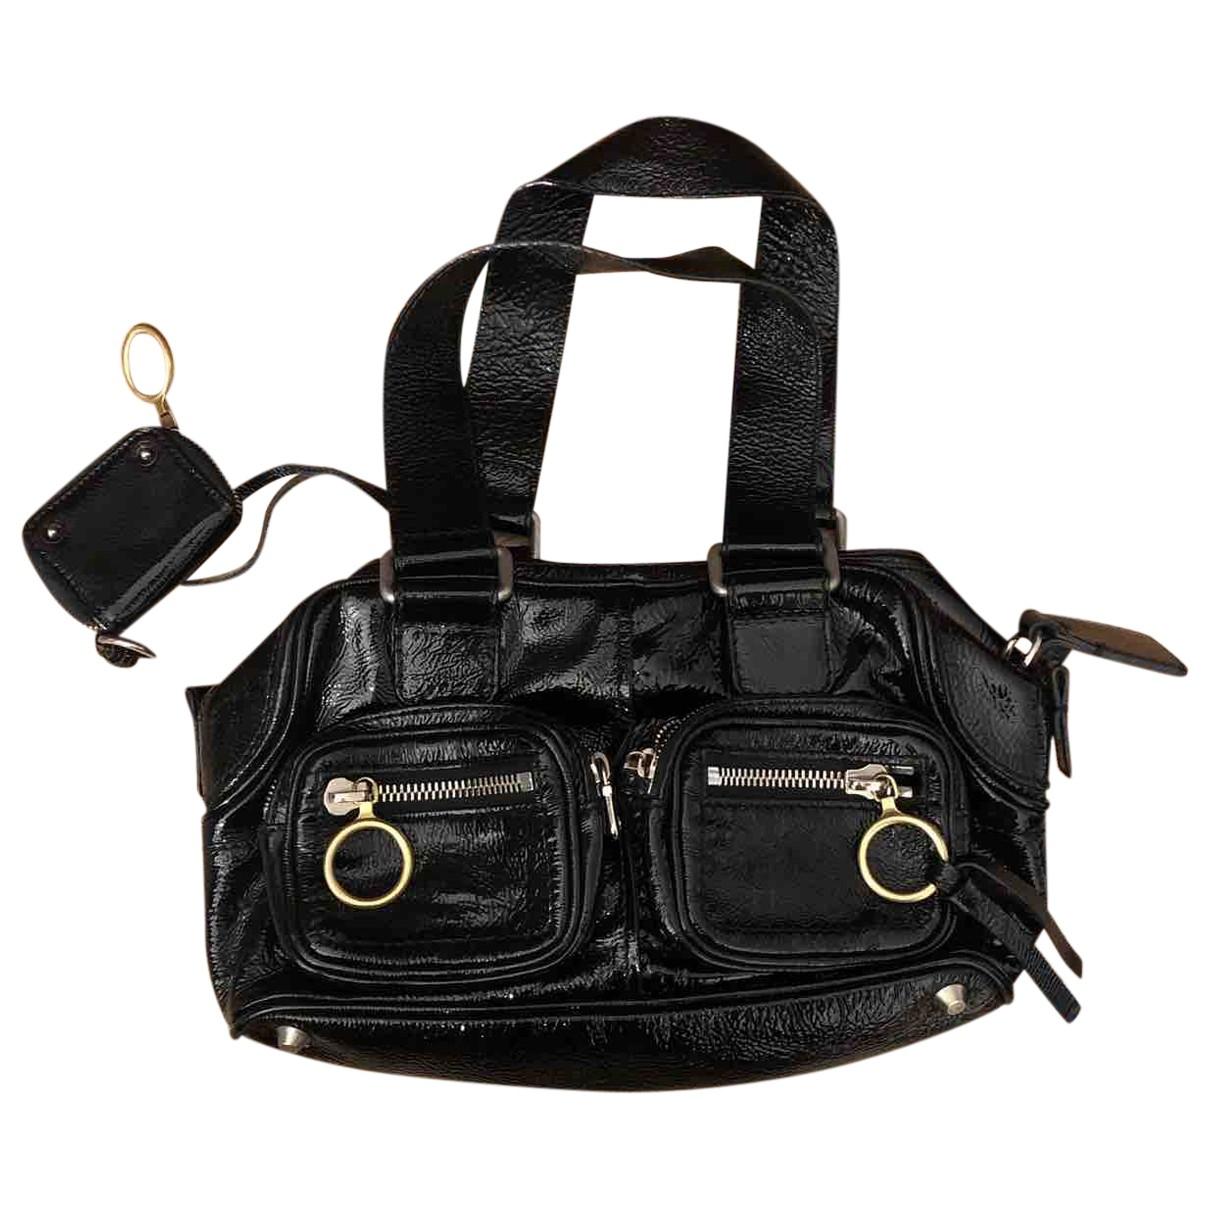 Chloé \N Black Patent leather handbag for Women \N